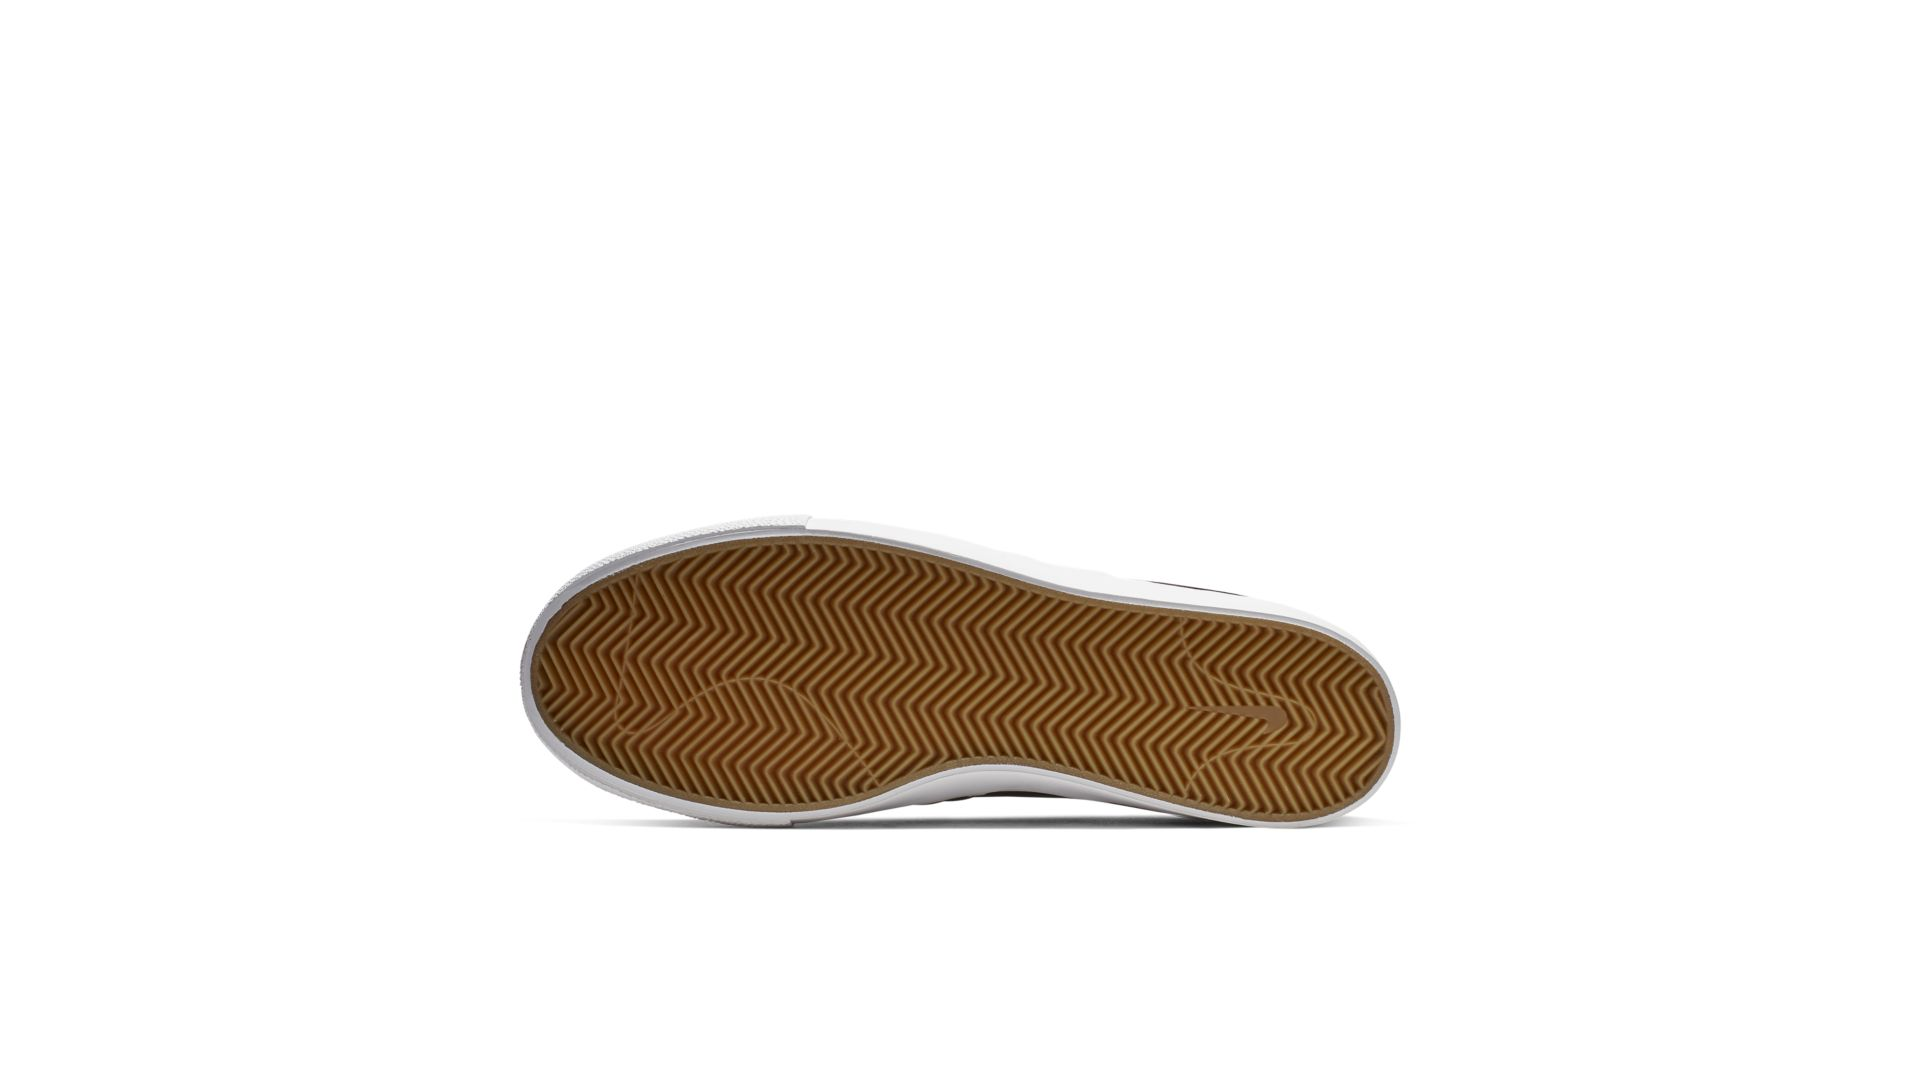 Nike SB Zoom Stefan Janoski Slip RM Crafted Woven Mahogany (AR4883-201)